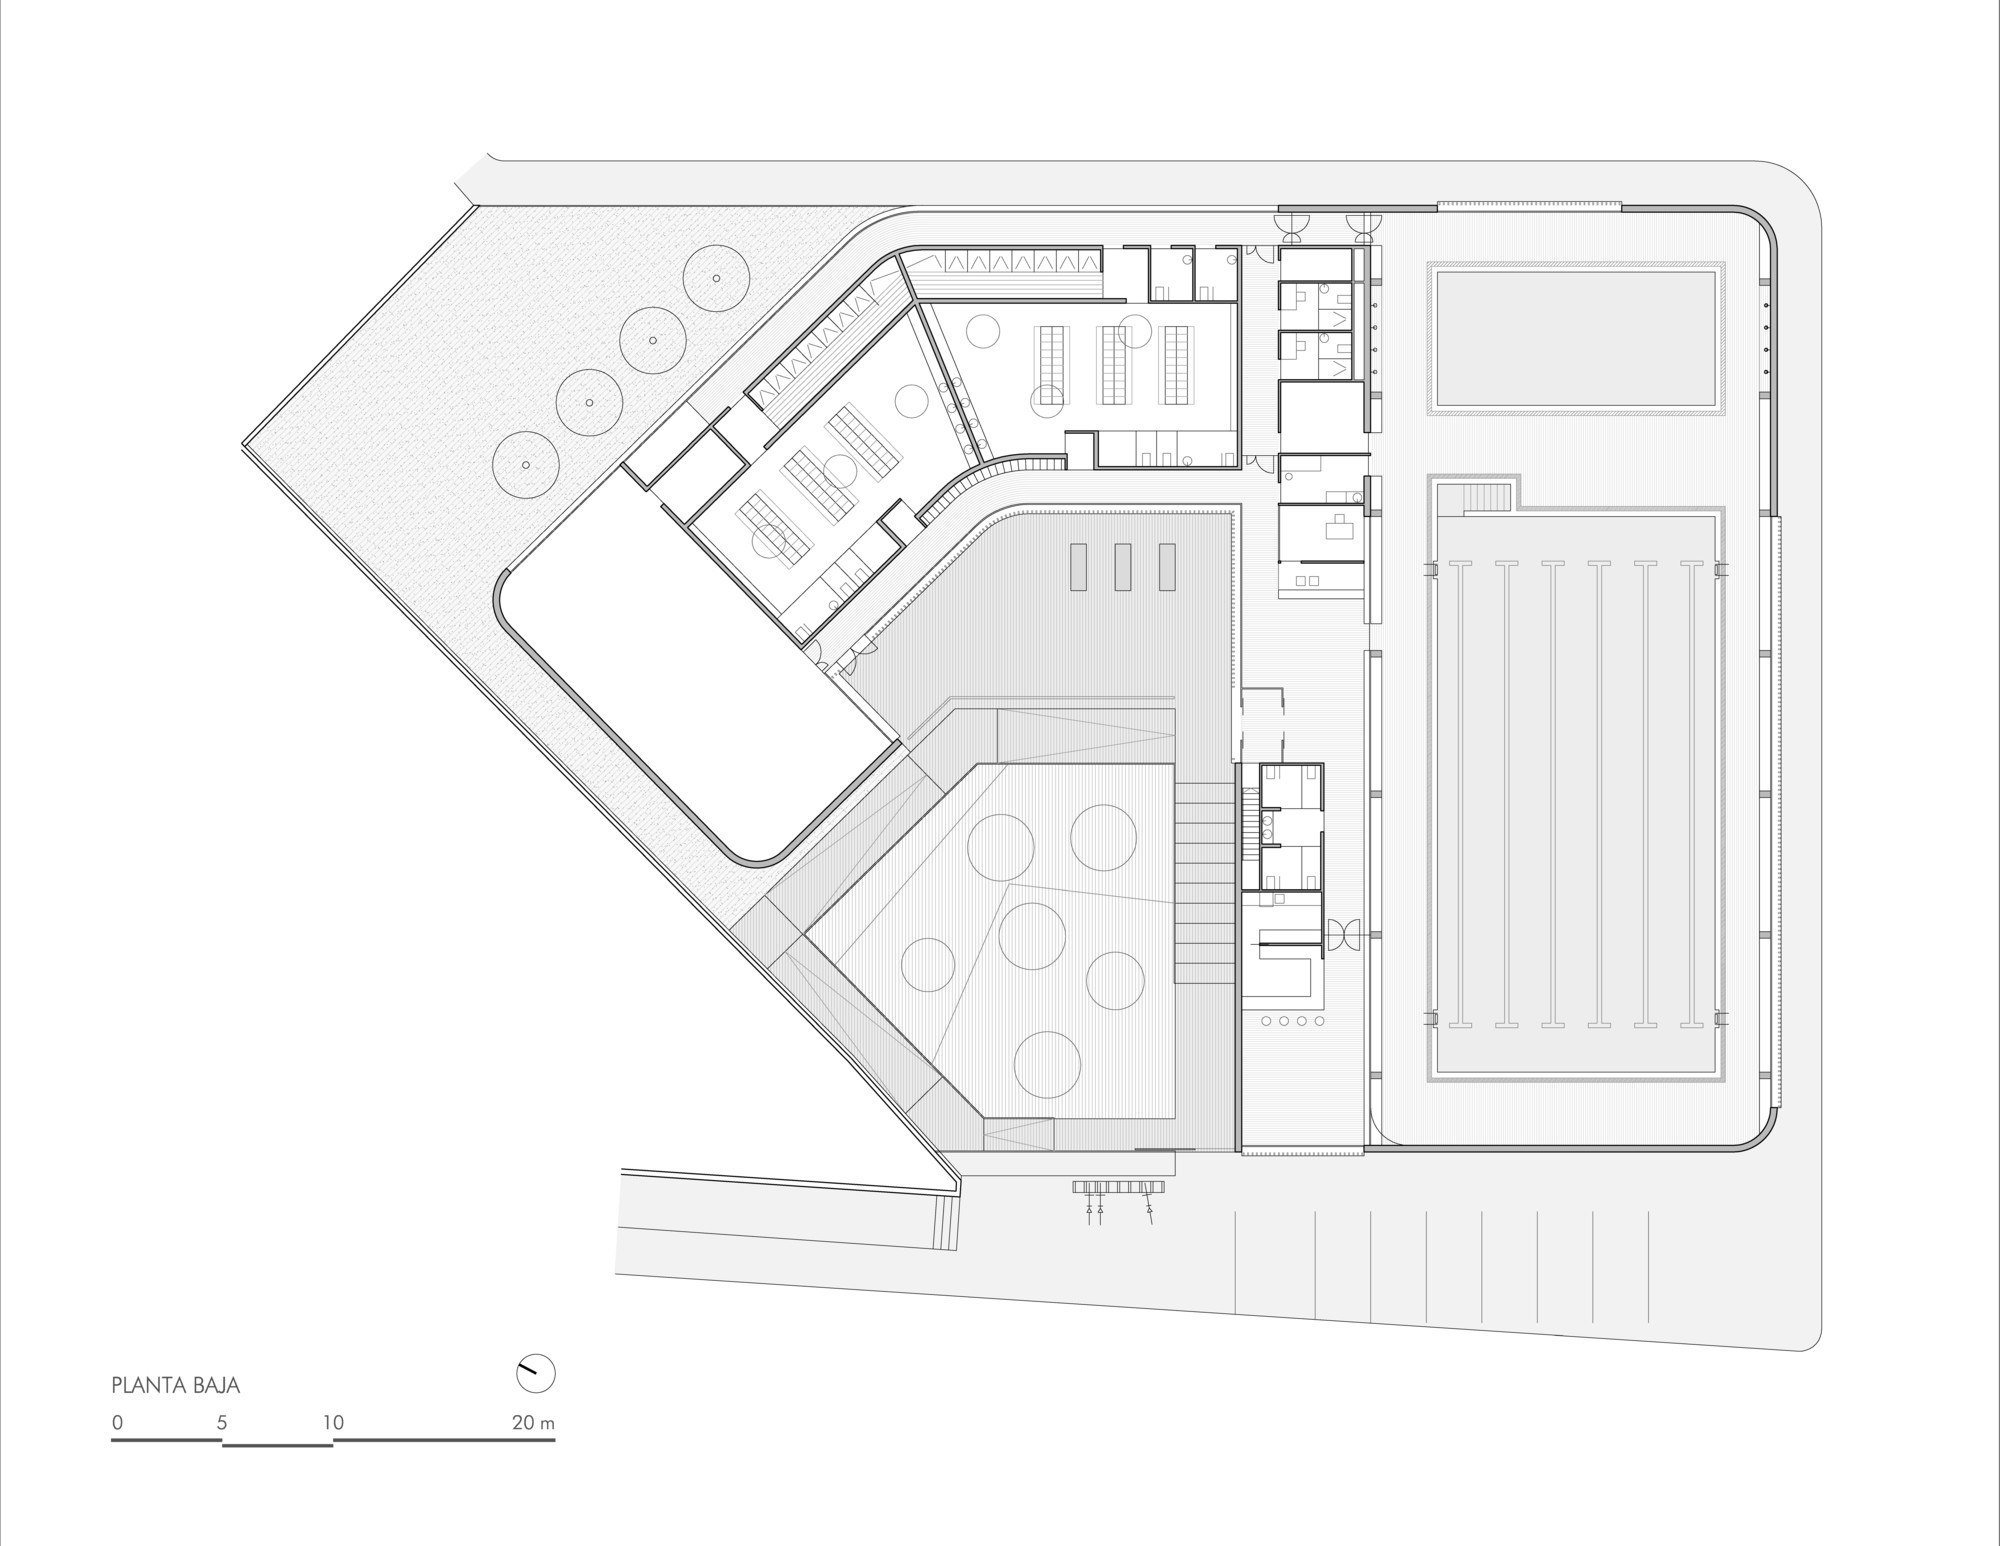 municipal indoor pool in constantina suárez corchete archdaily